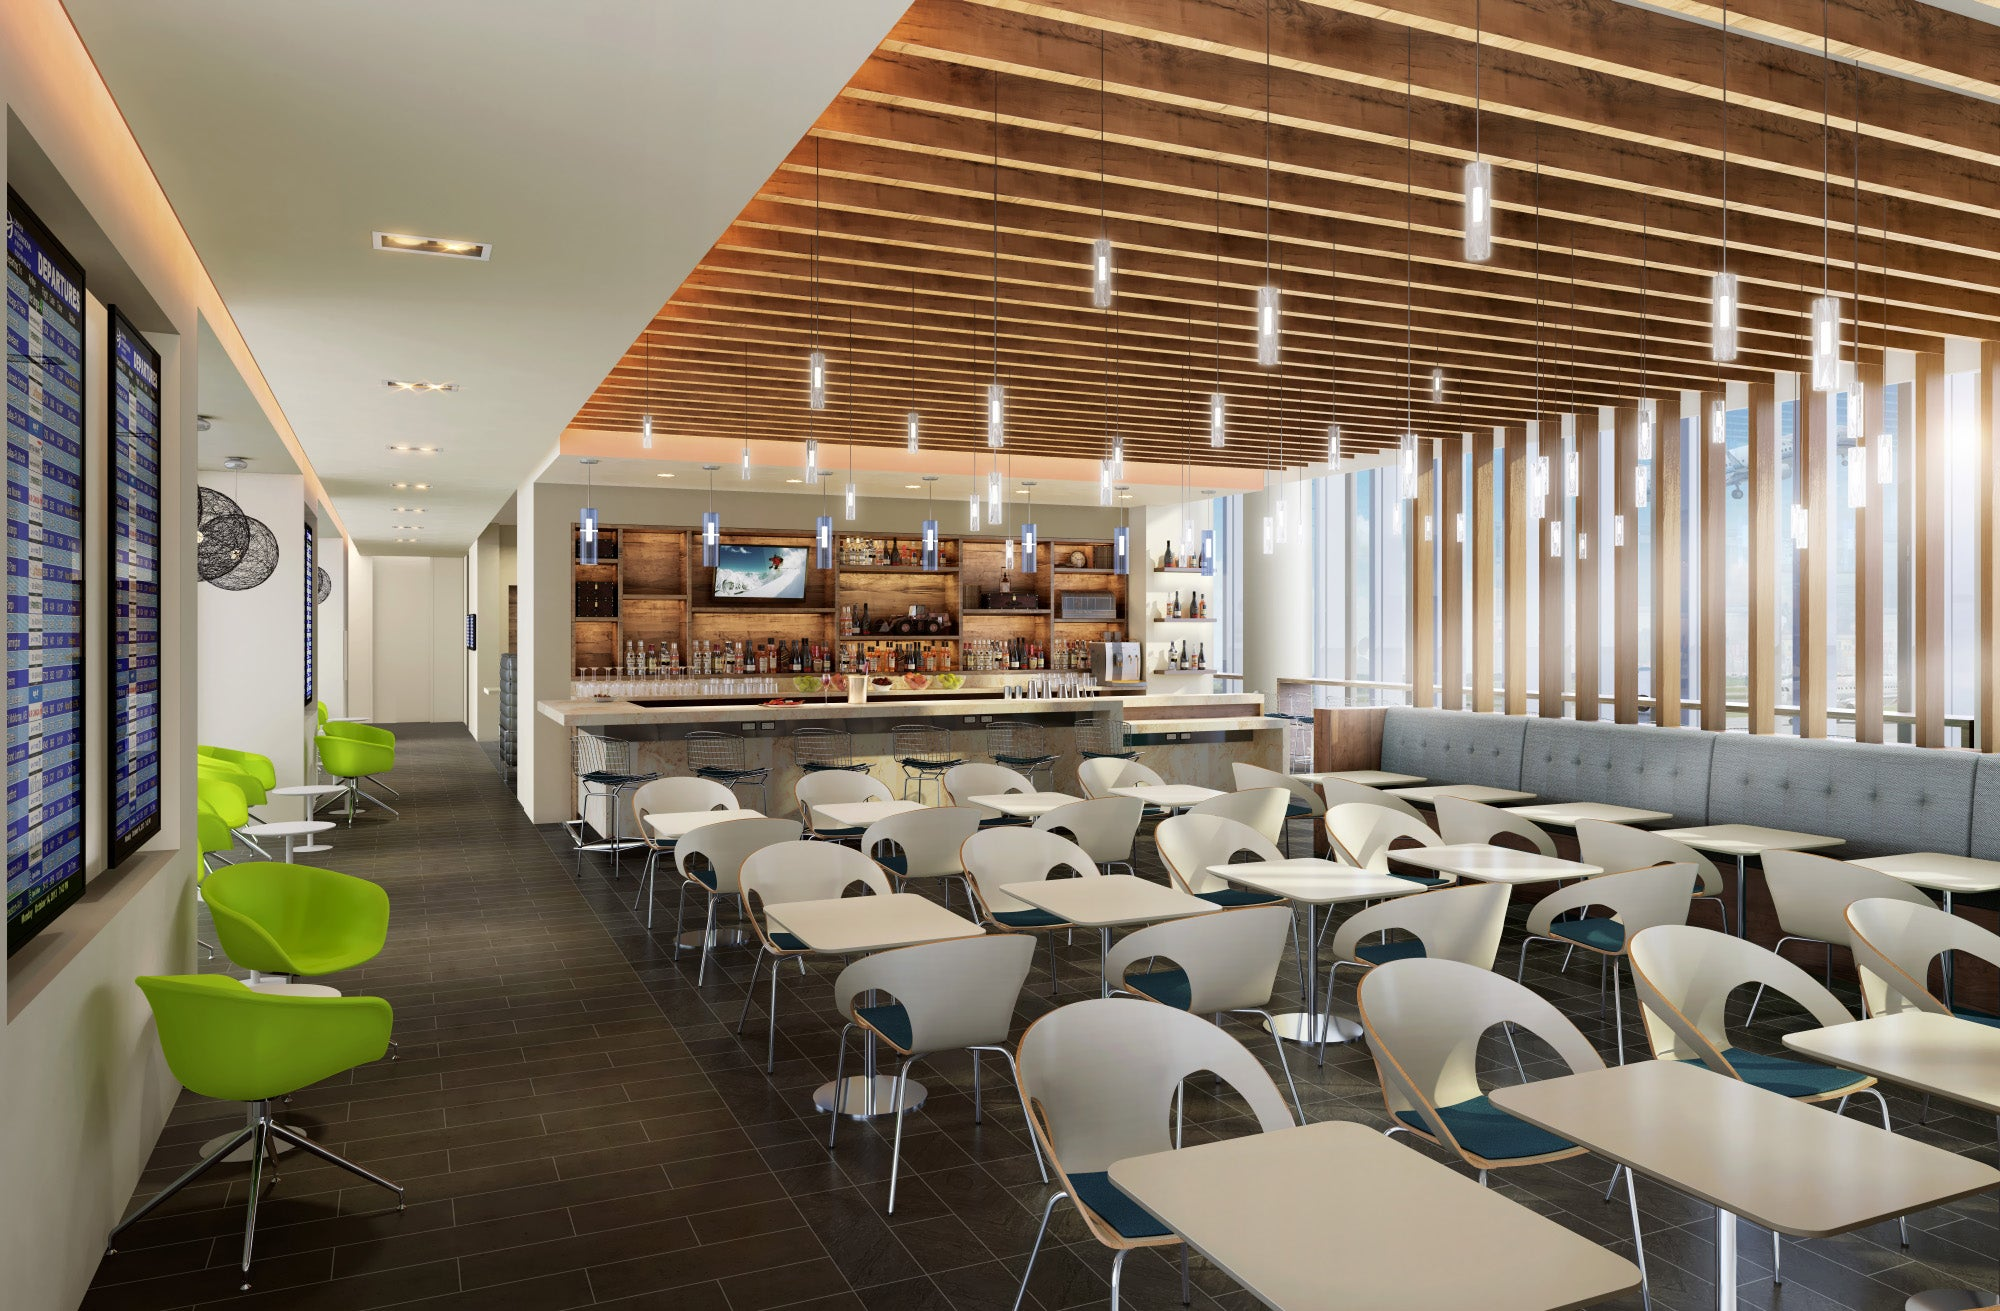 A Rendering Of The New Philadelphia Centurion Lounge